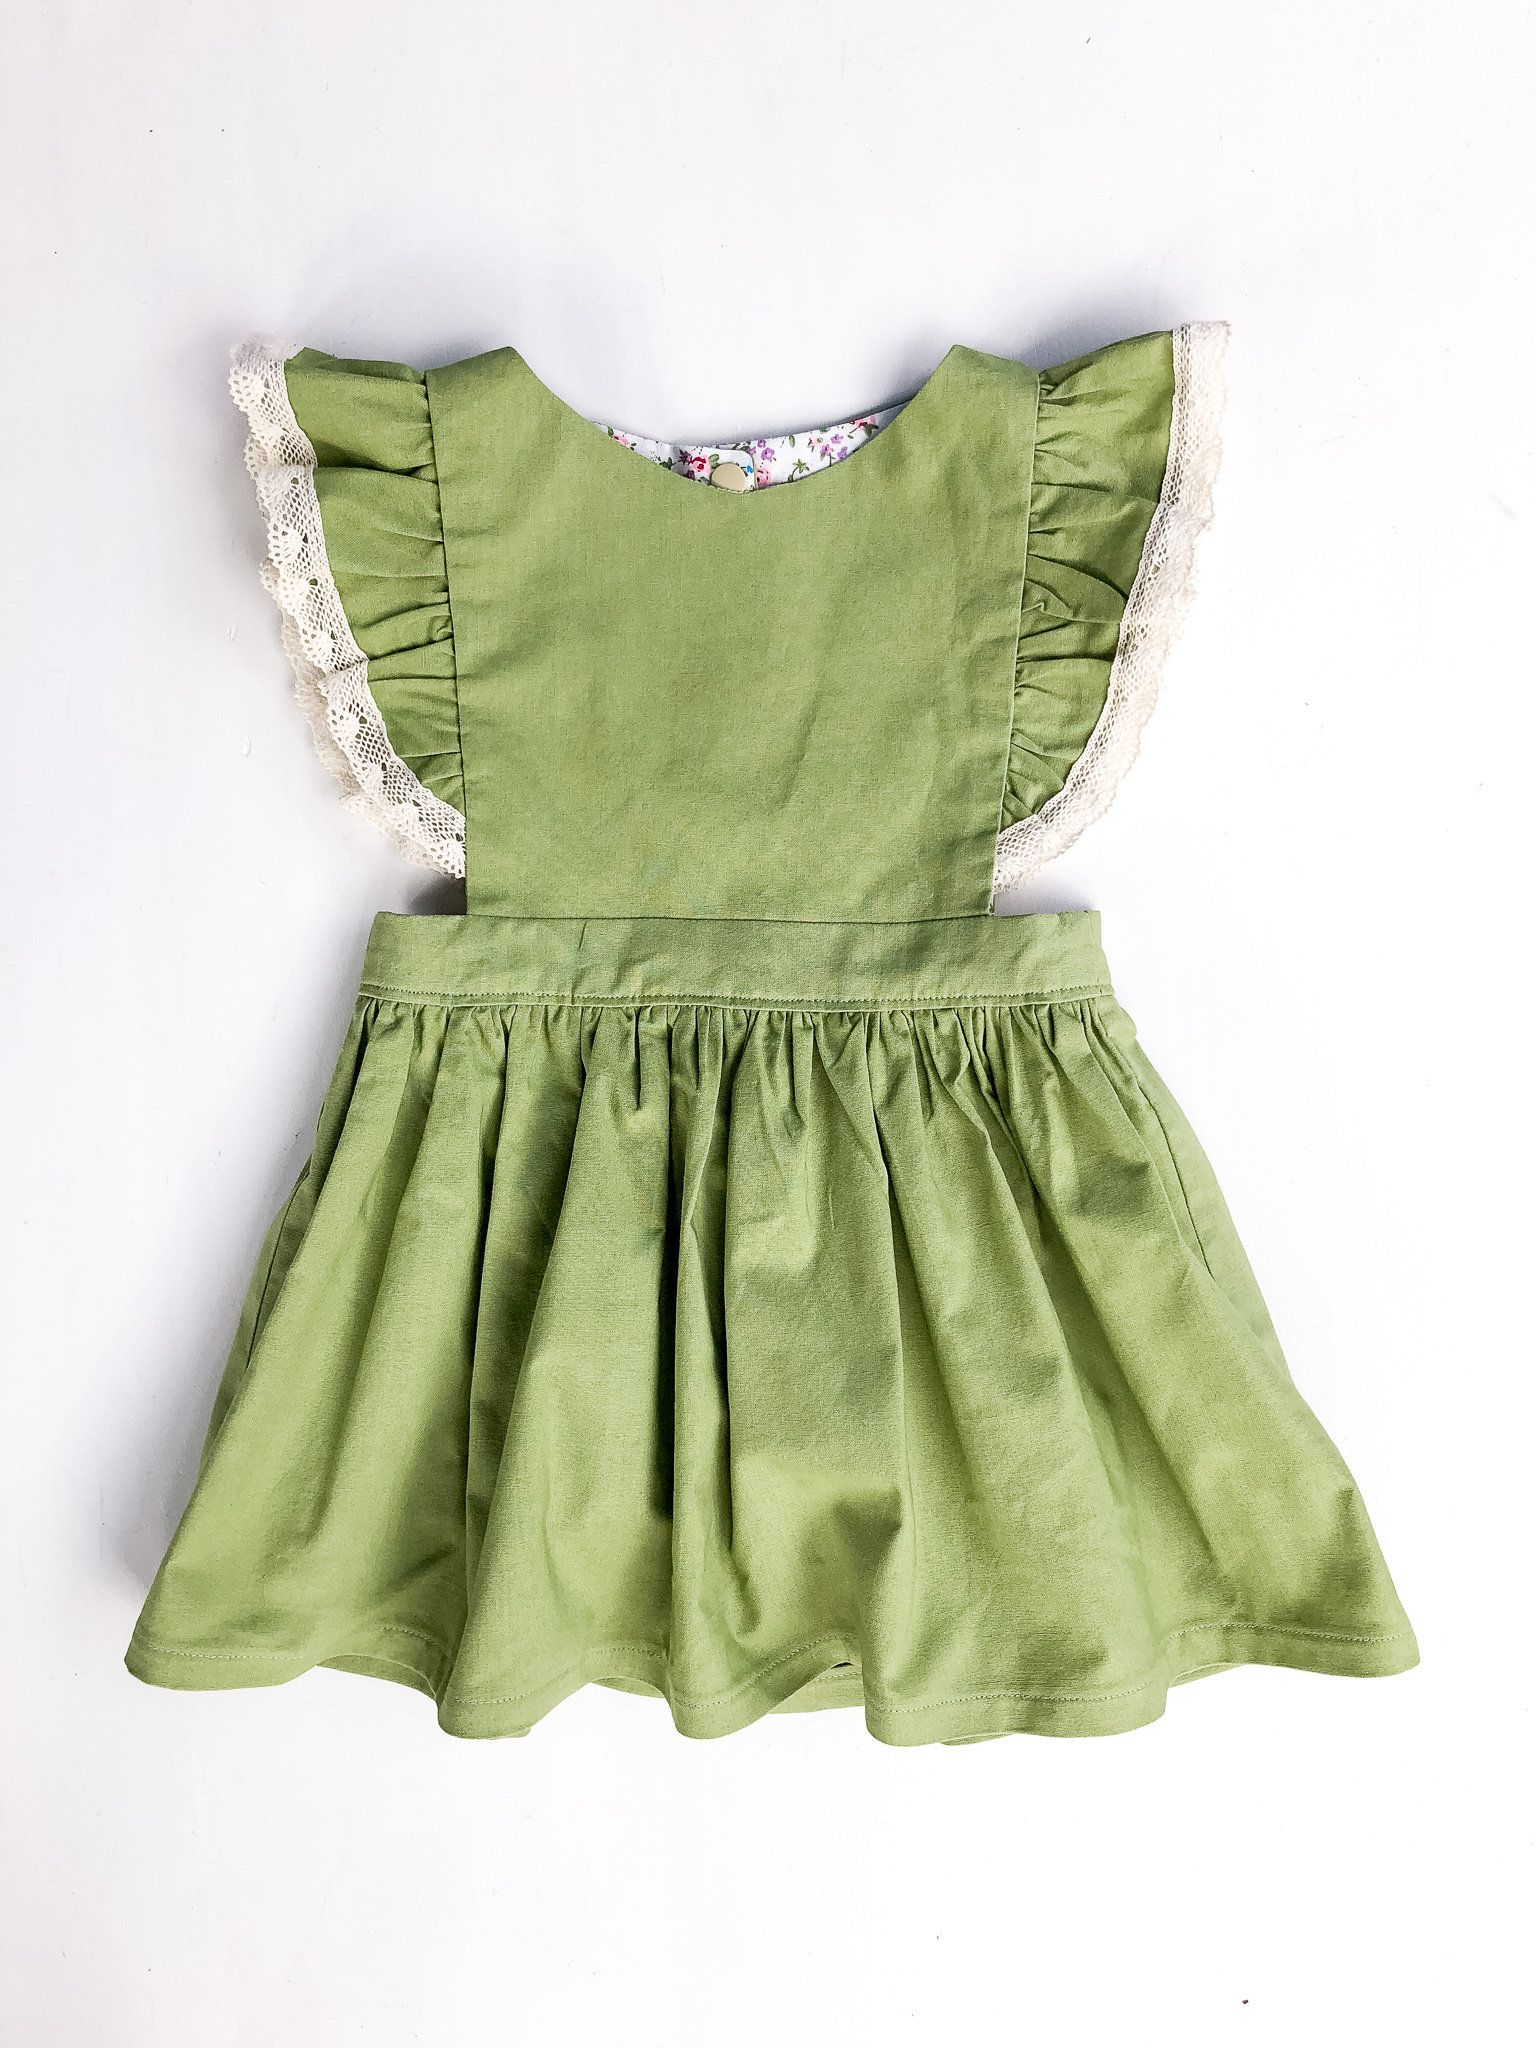 Pistachio Pinafore Dress Pinafore dress, Dresses, Girls